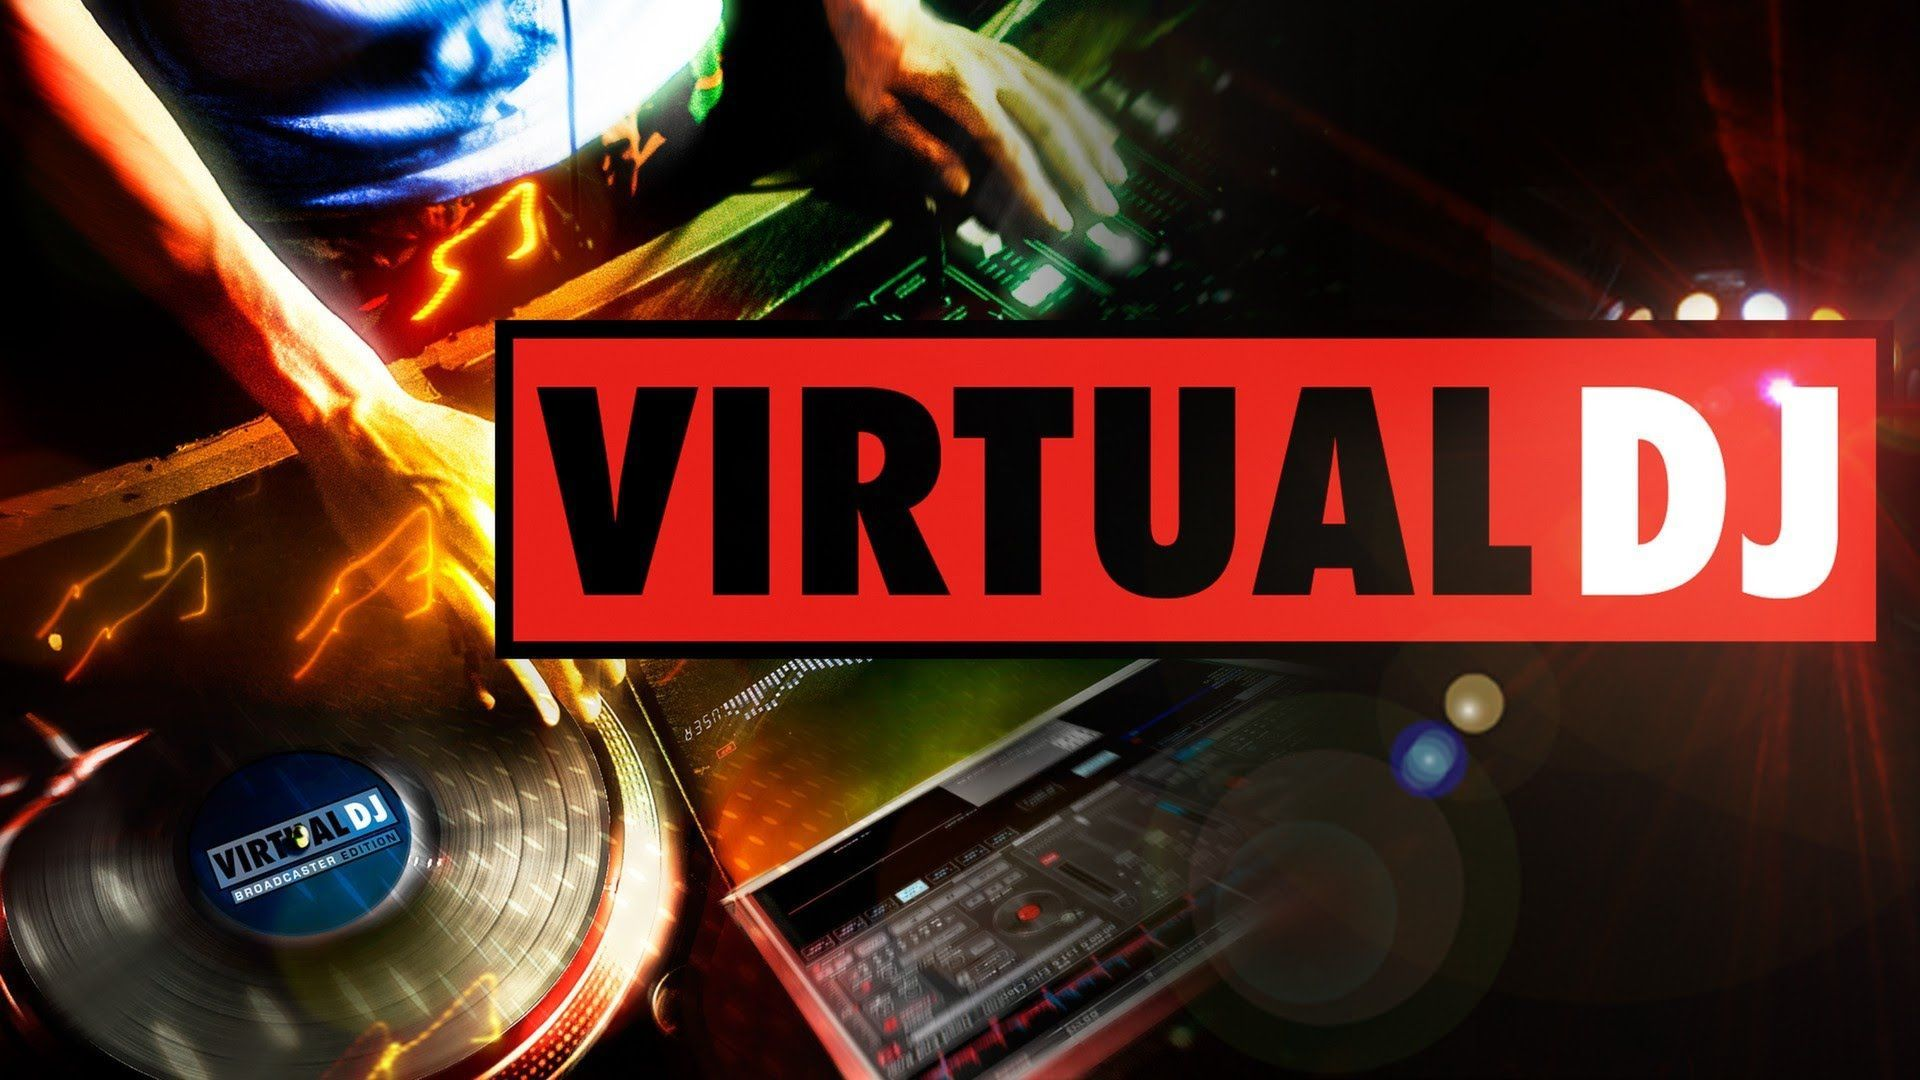 تحميل برنامج دي جي Virtual DJ برابط مباشر